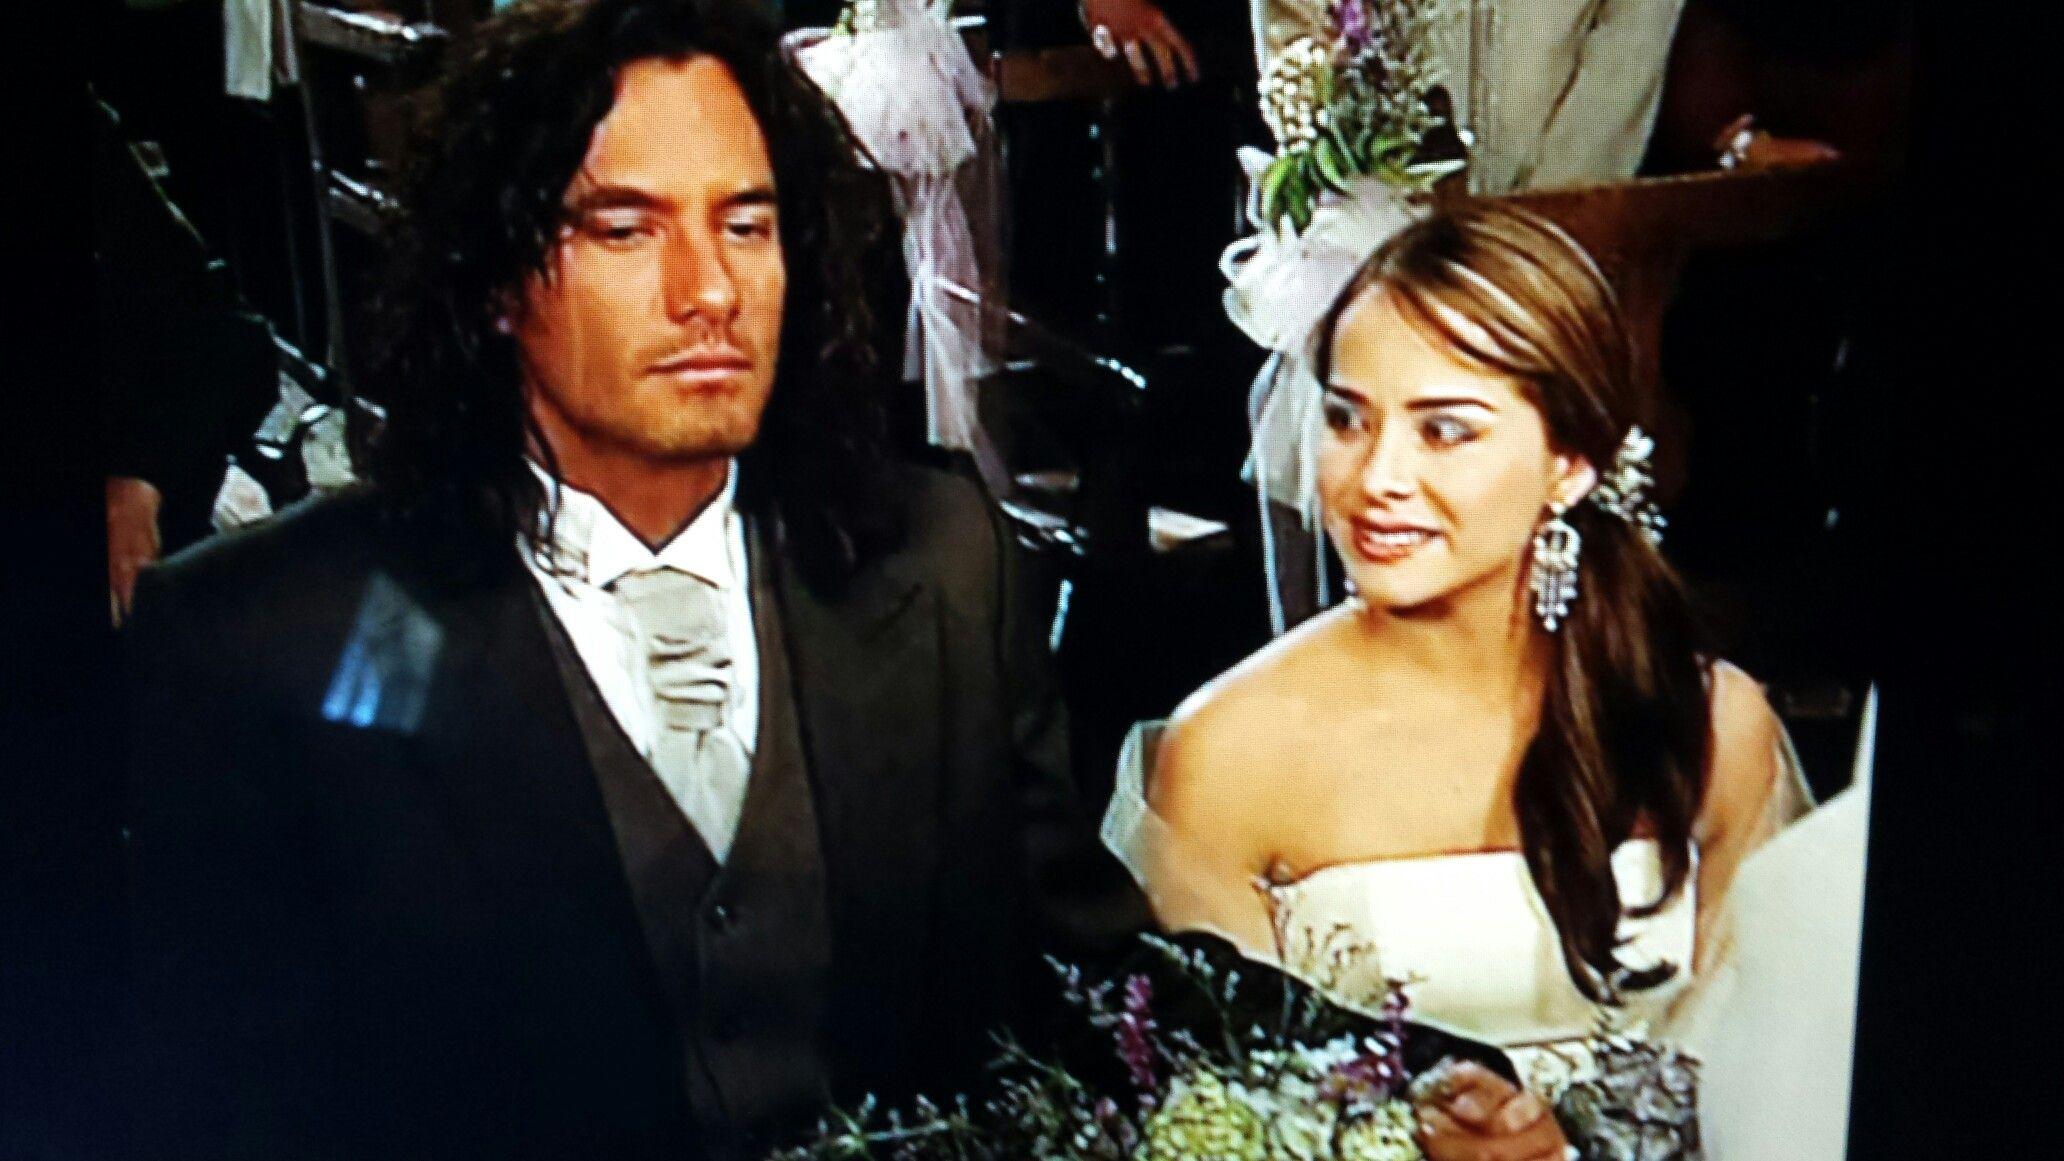 danna garcia married